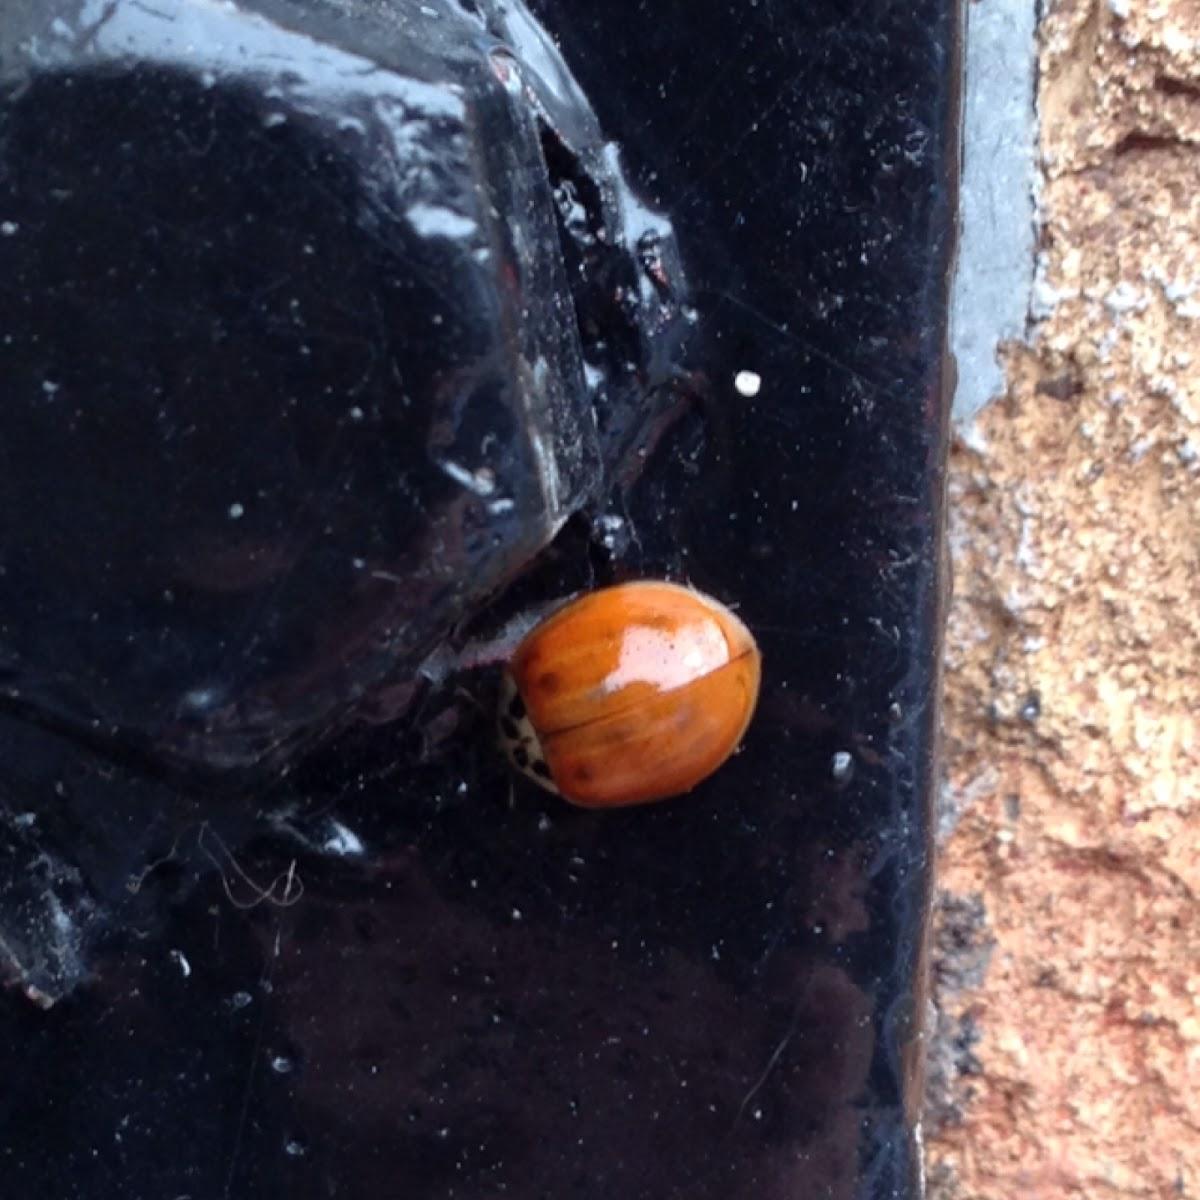 Harlequin ladybird (Божья коровка)